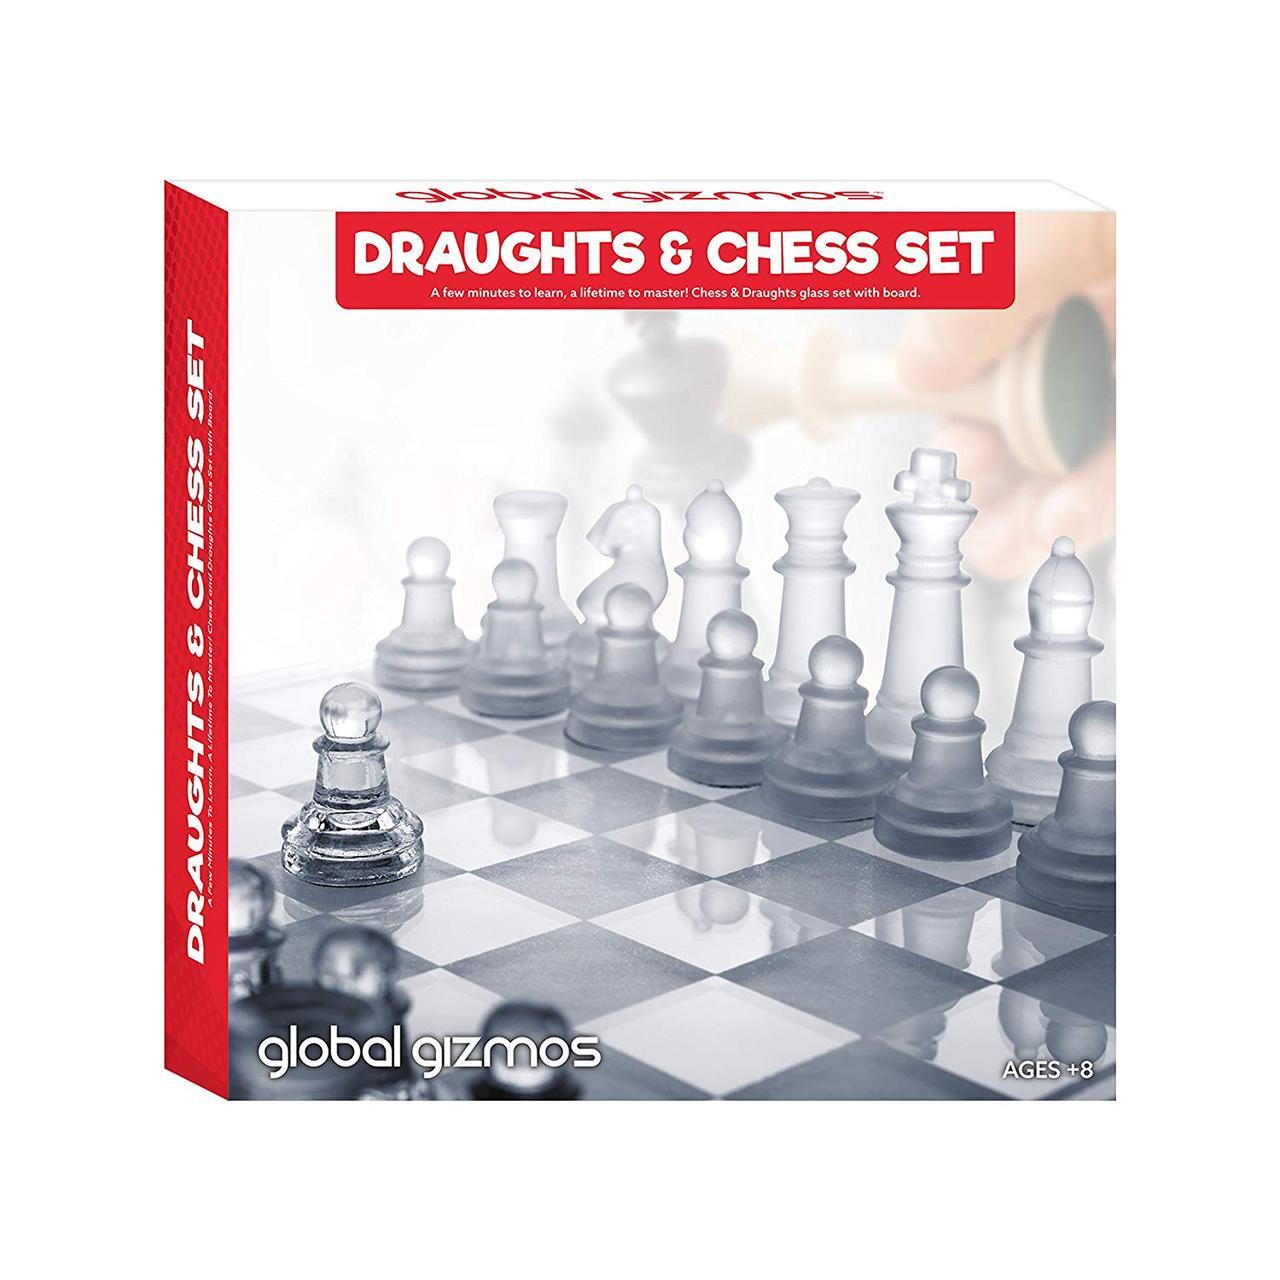 Гра 2 в 1 шахмати і шашки Global Gizmos Schach- und Damespiel aus Benross-Glas